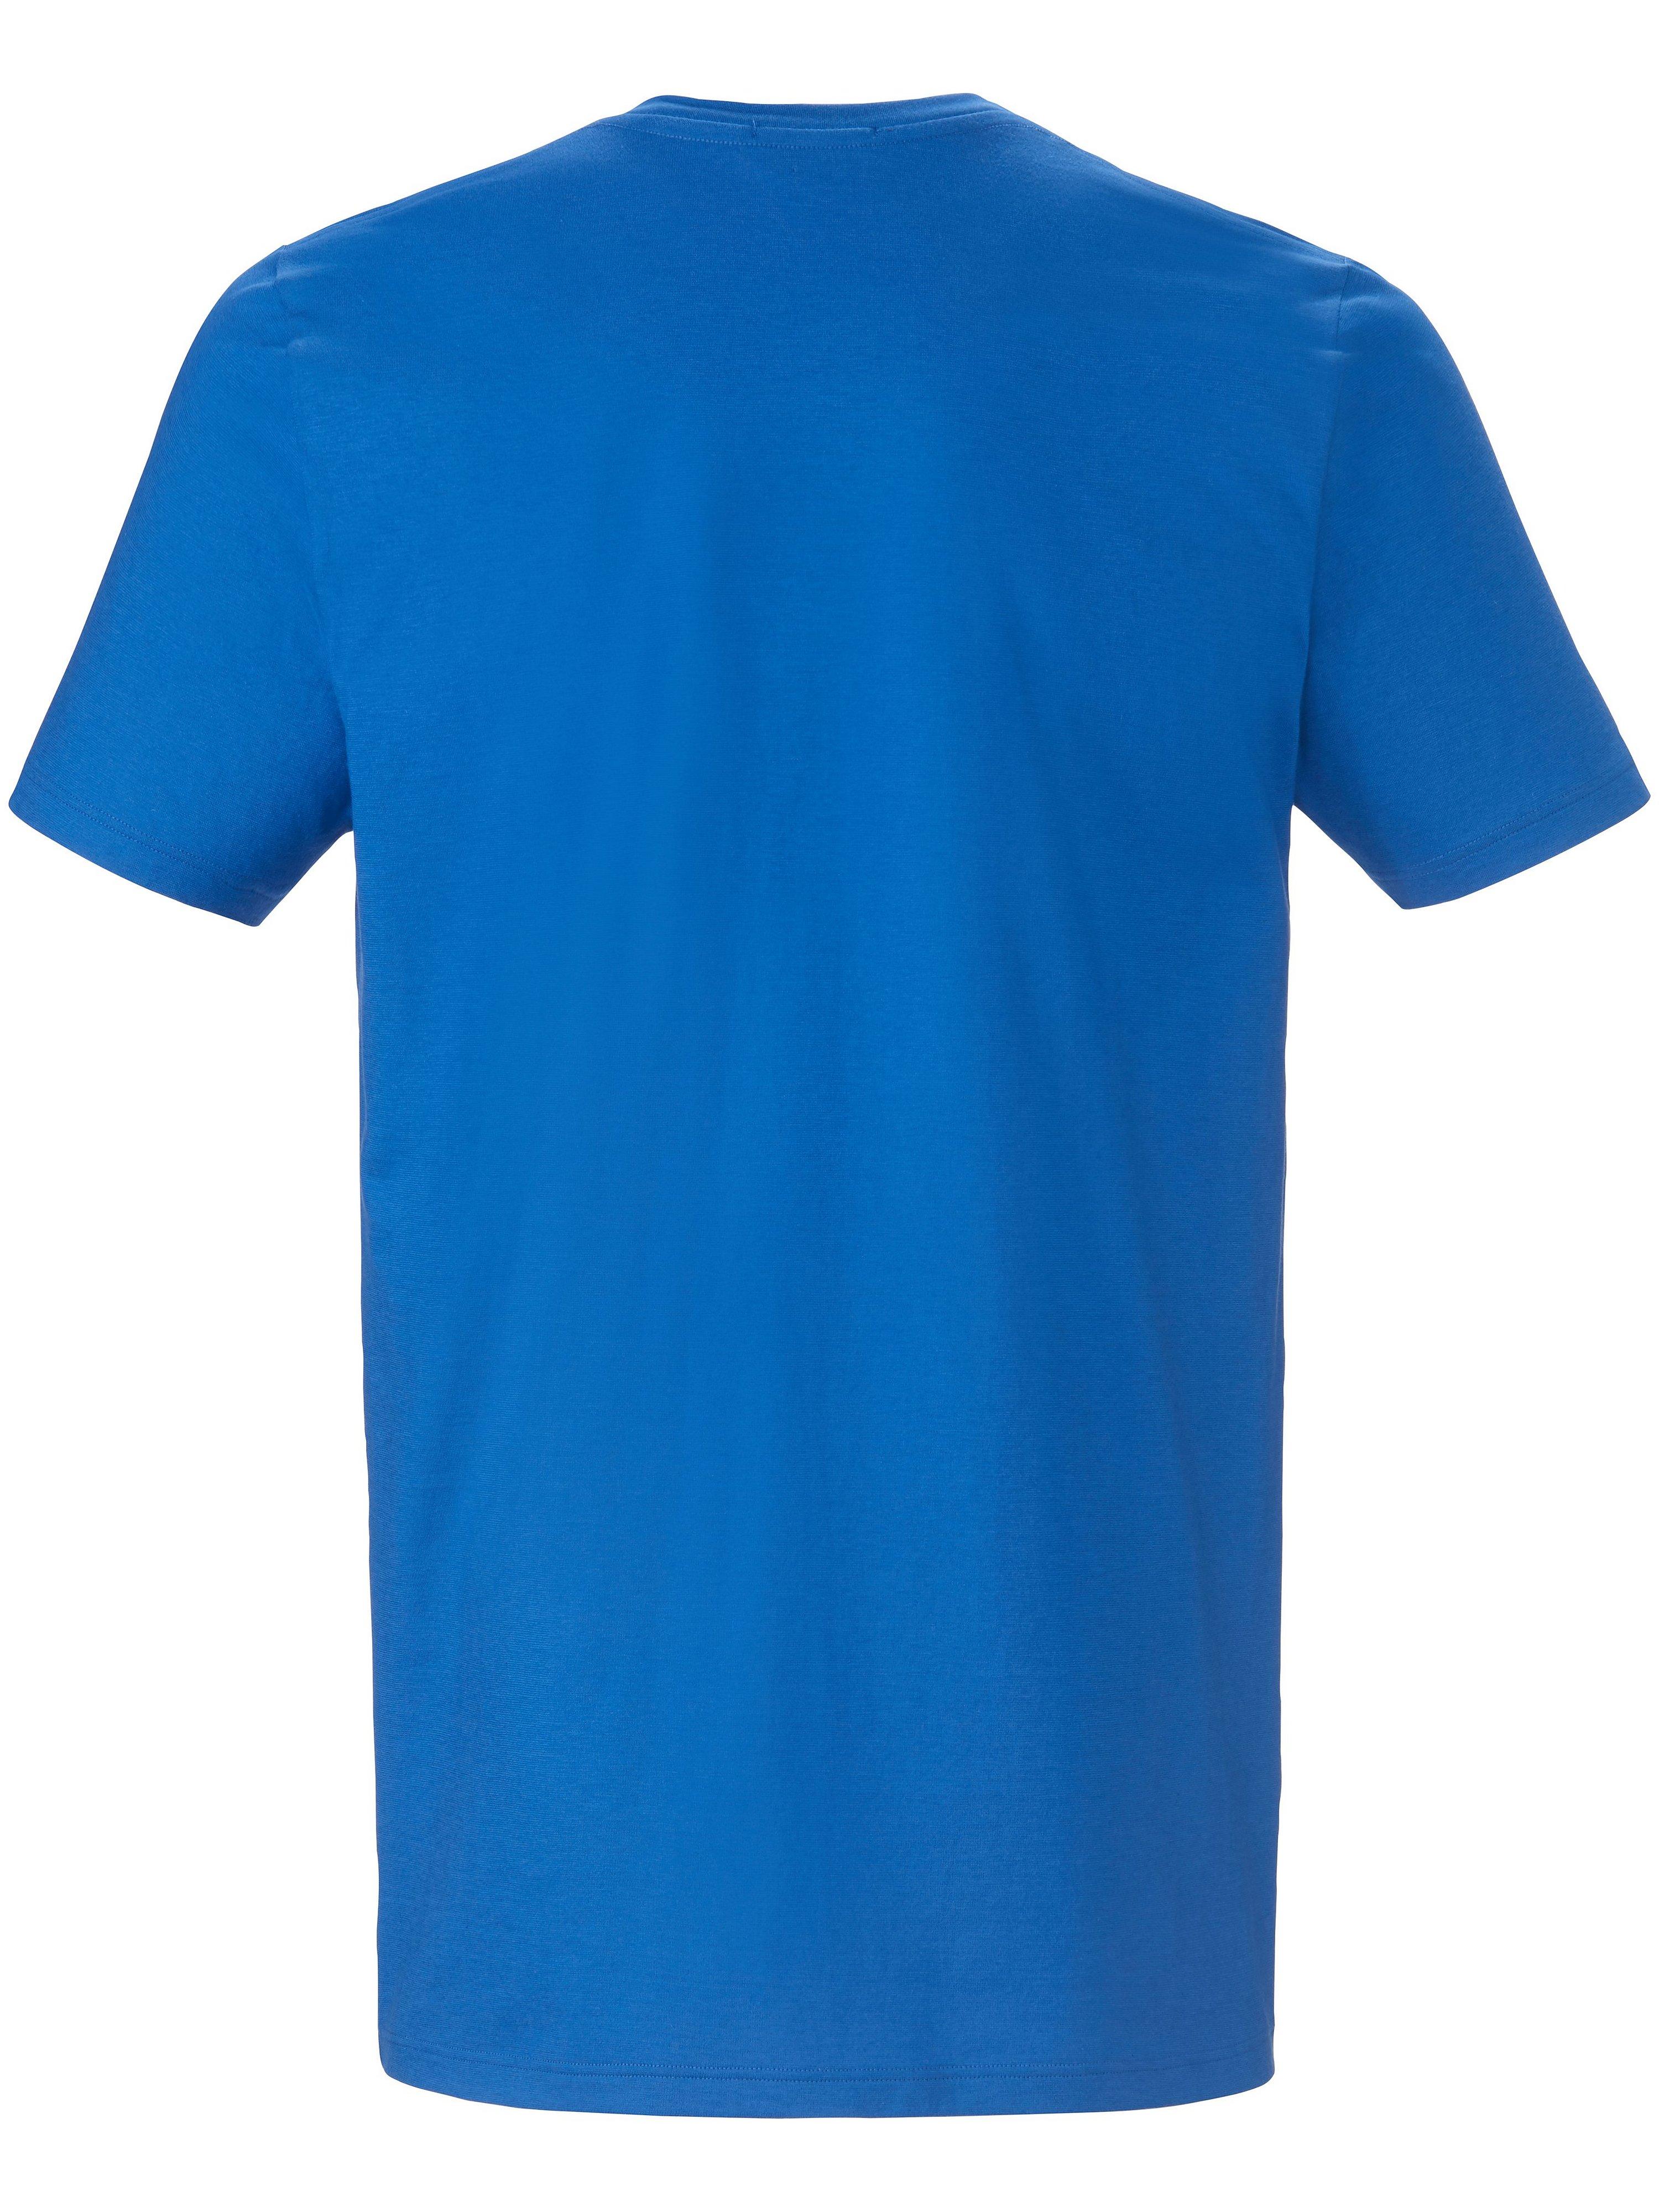 Sleepshirt korte ærmer Fra Mey blå